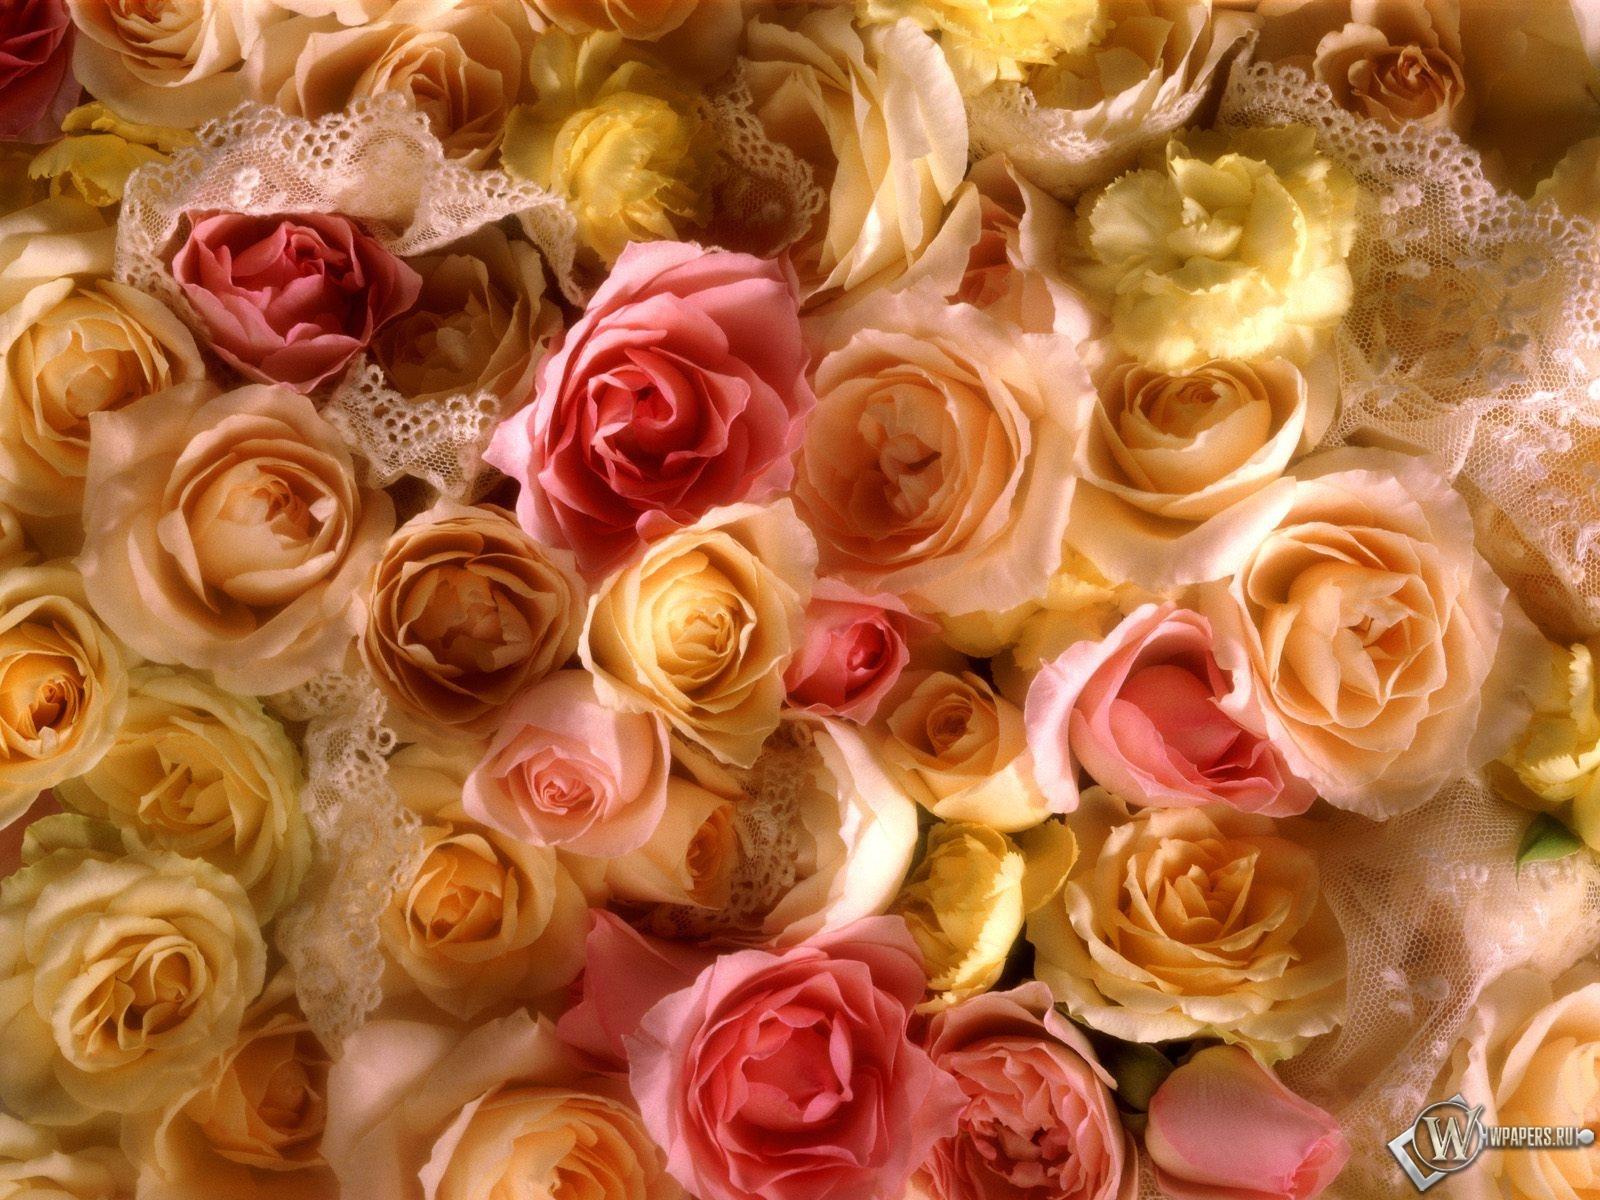 Желтые розы 1600x1200